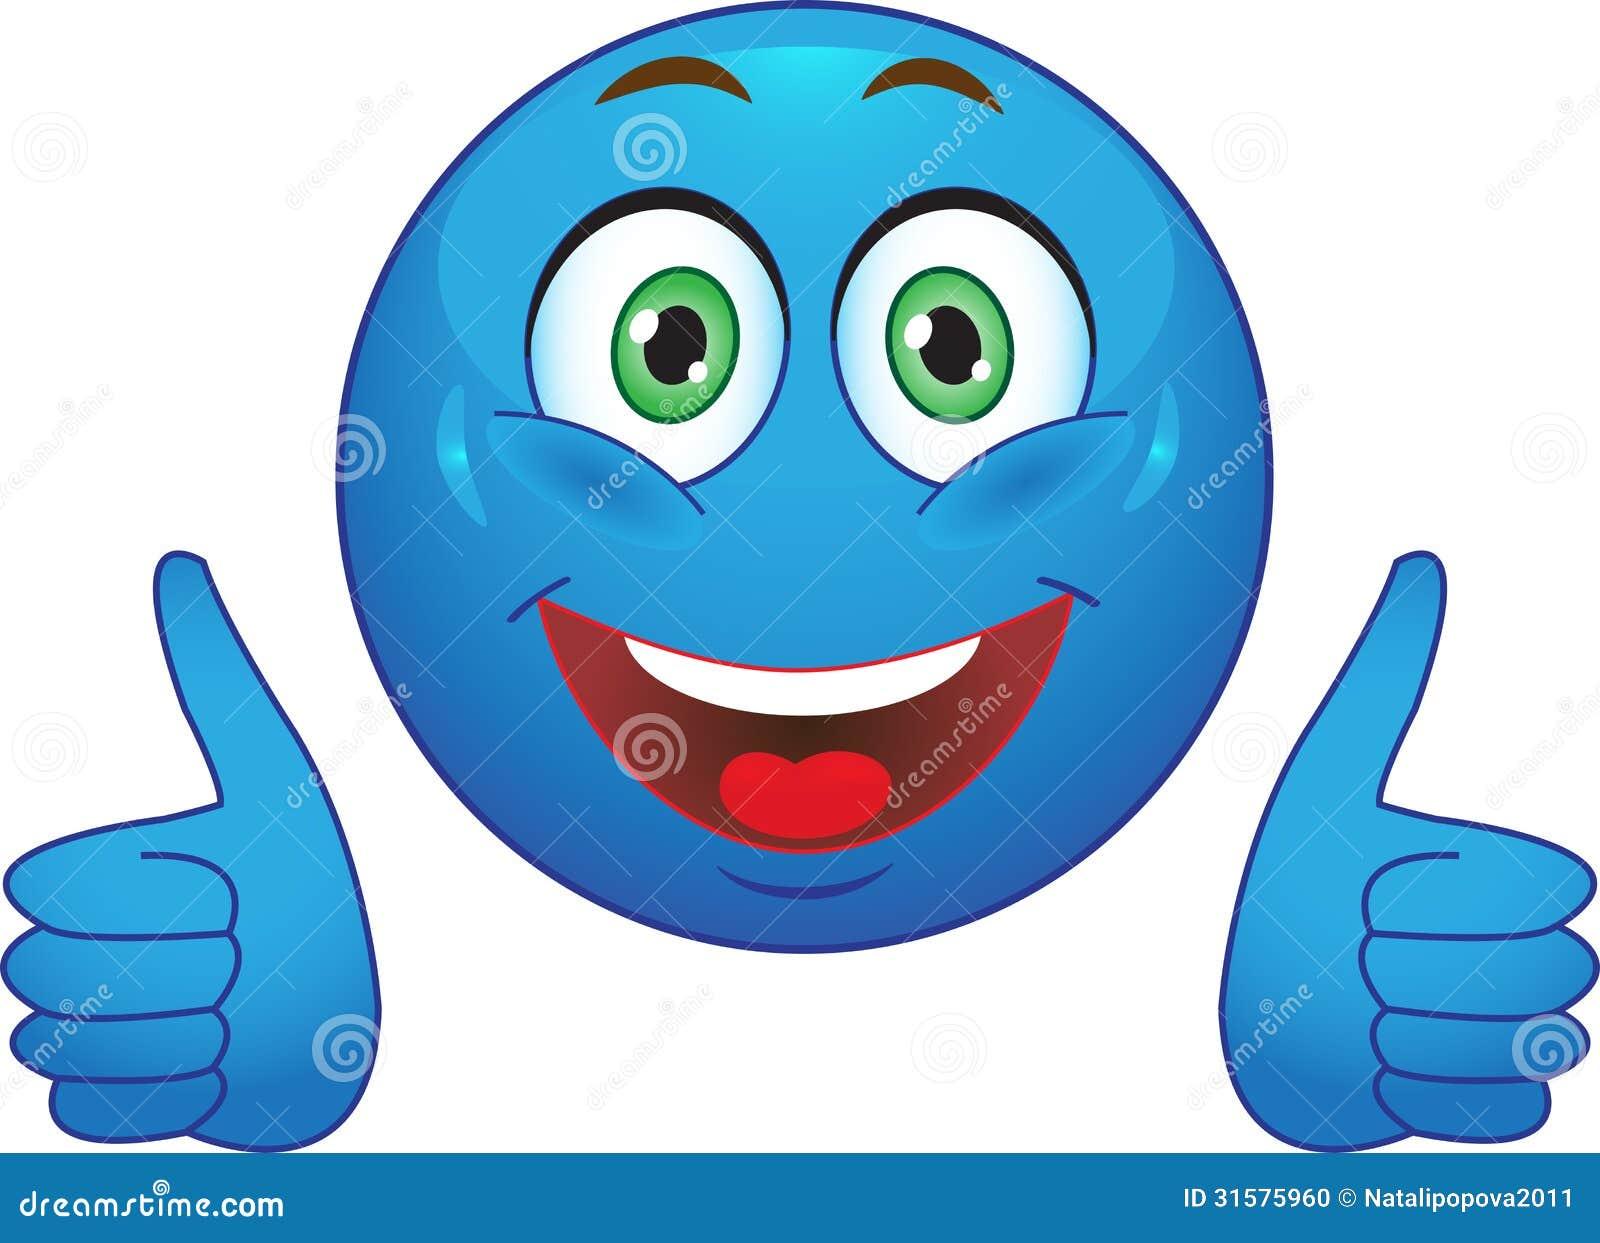 grinning and happy joy kogawa Harmonic convergence  ian graham storyboard by: toshiyasu kogawa, owen sullivan, melchior zwyer animation by: studio mir  grinning wider).